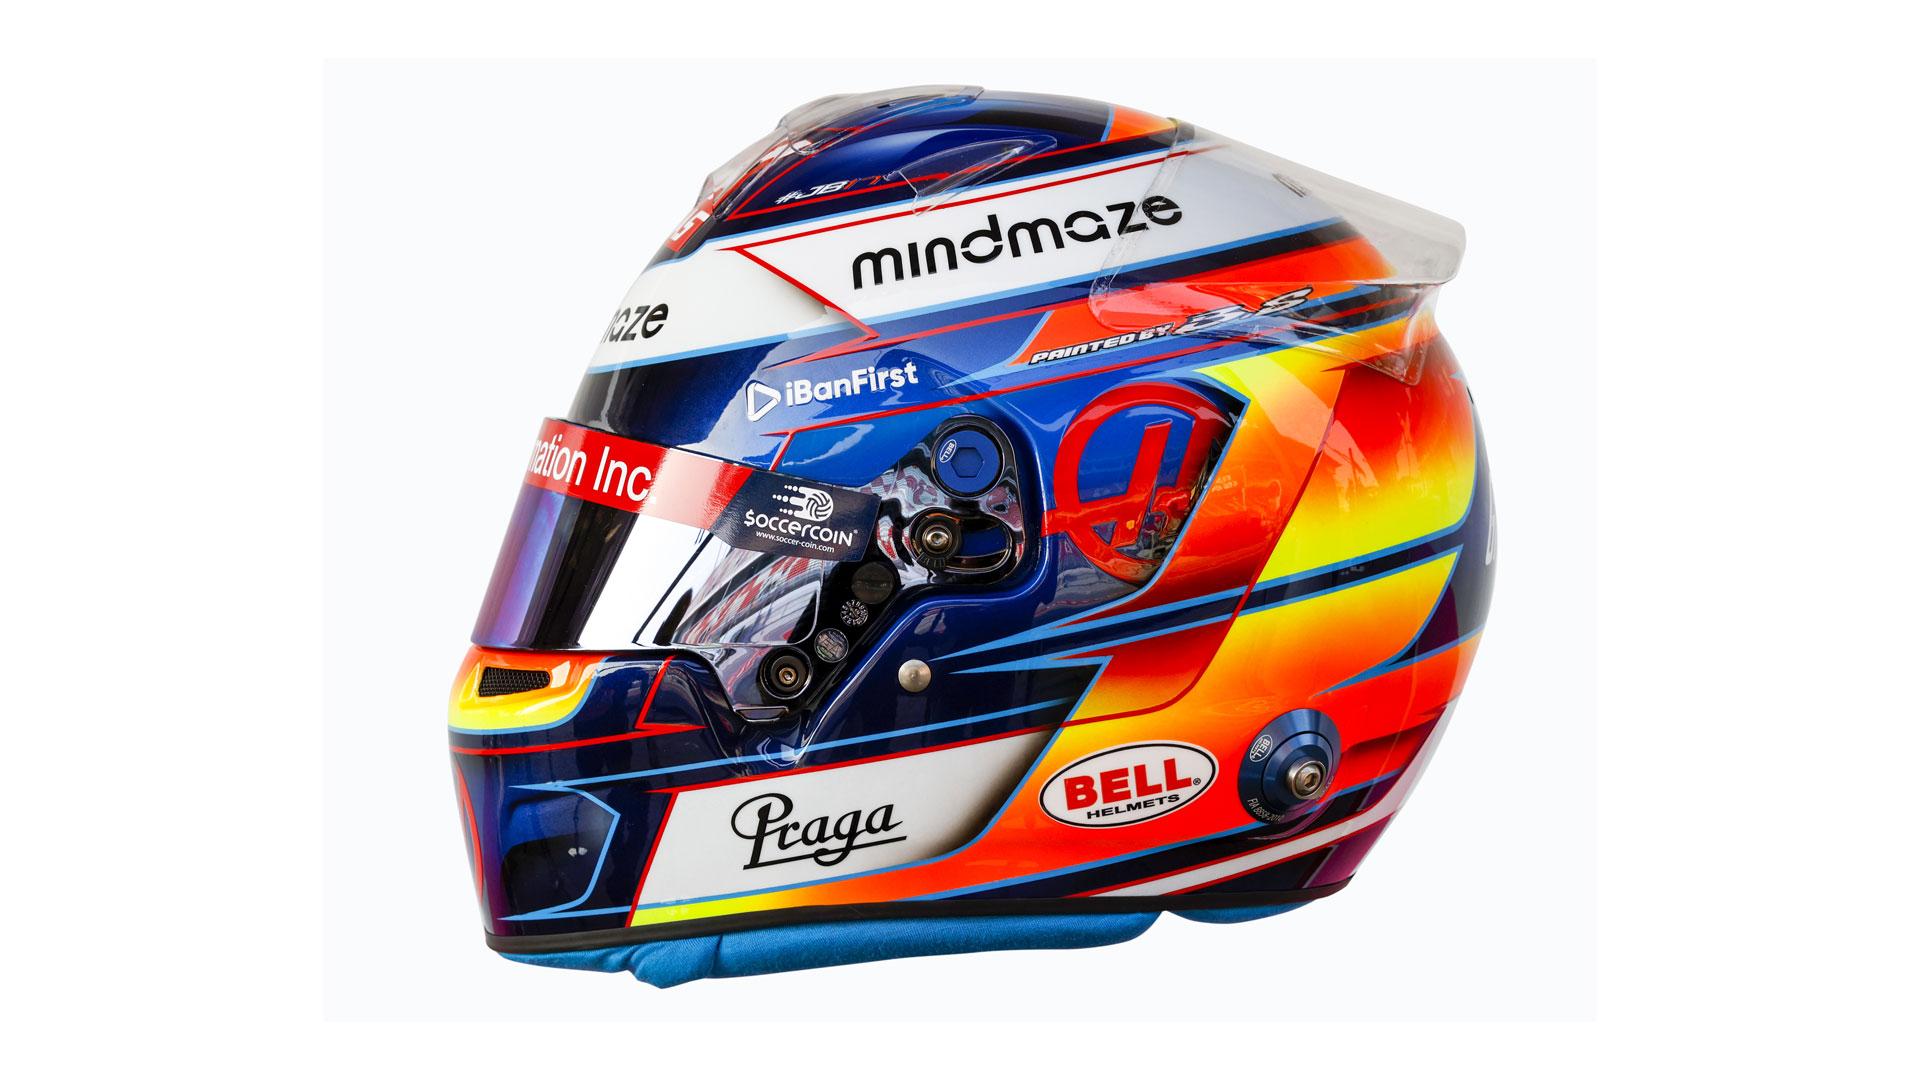 De helm van Romain Grosjean